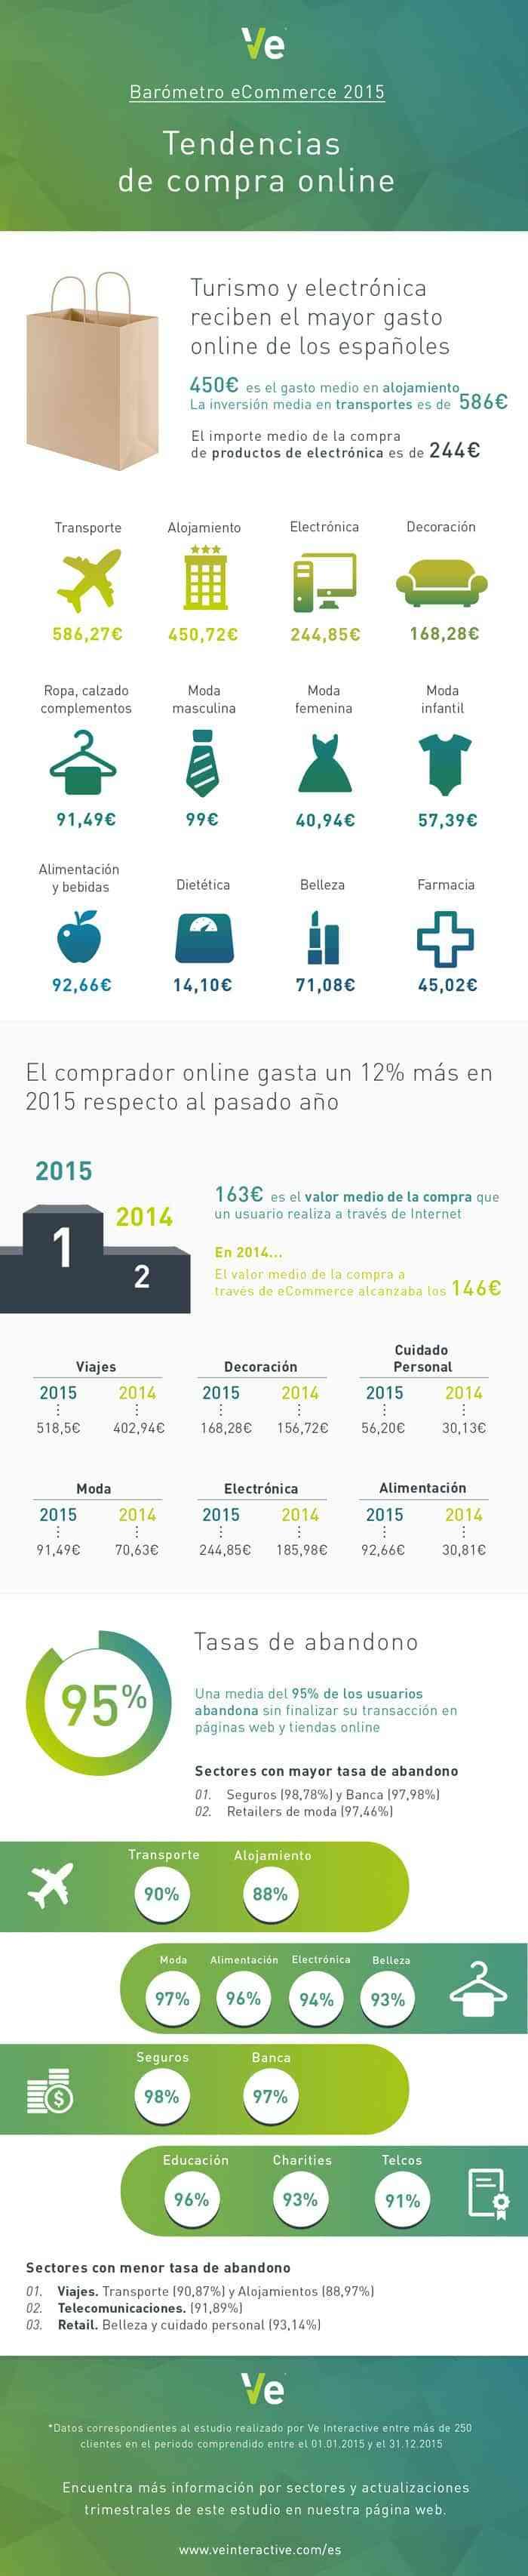 tendencia de compra online espana